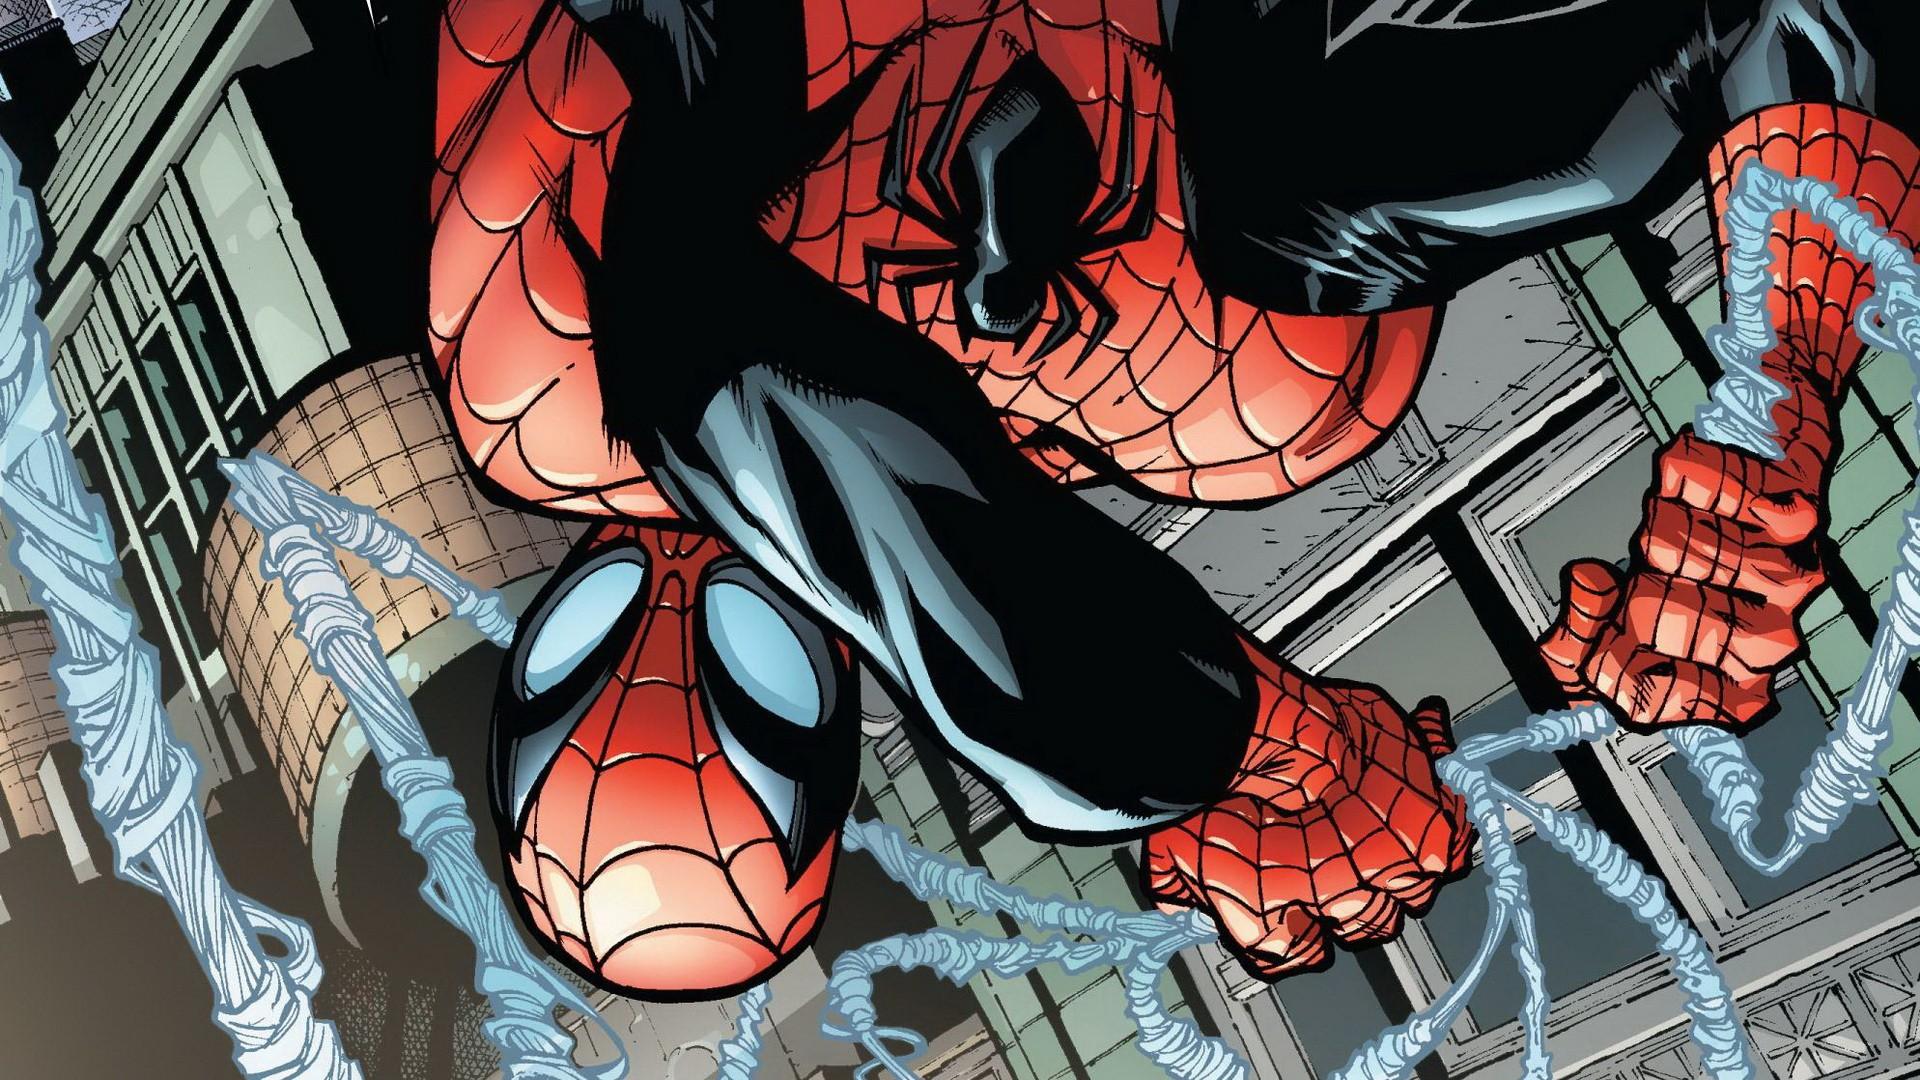 Spider man comic wallpaper - photo#20